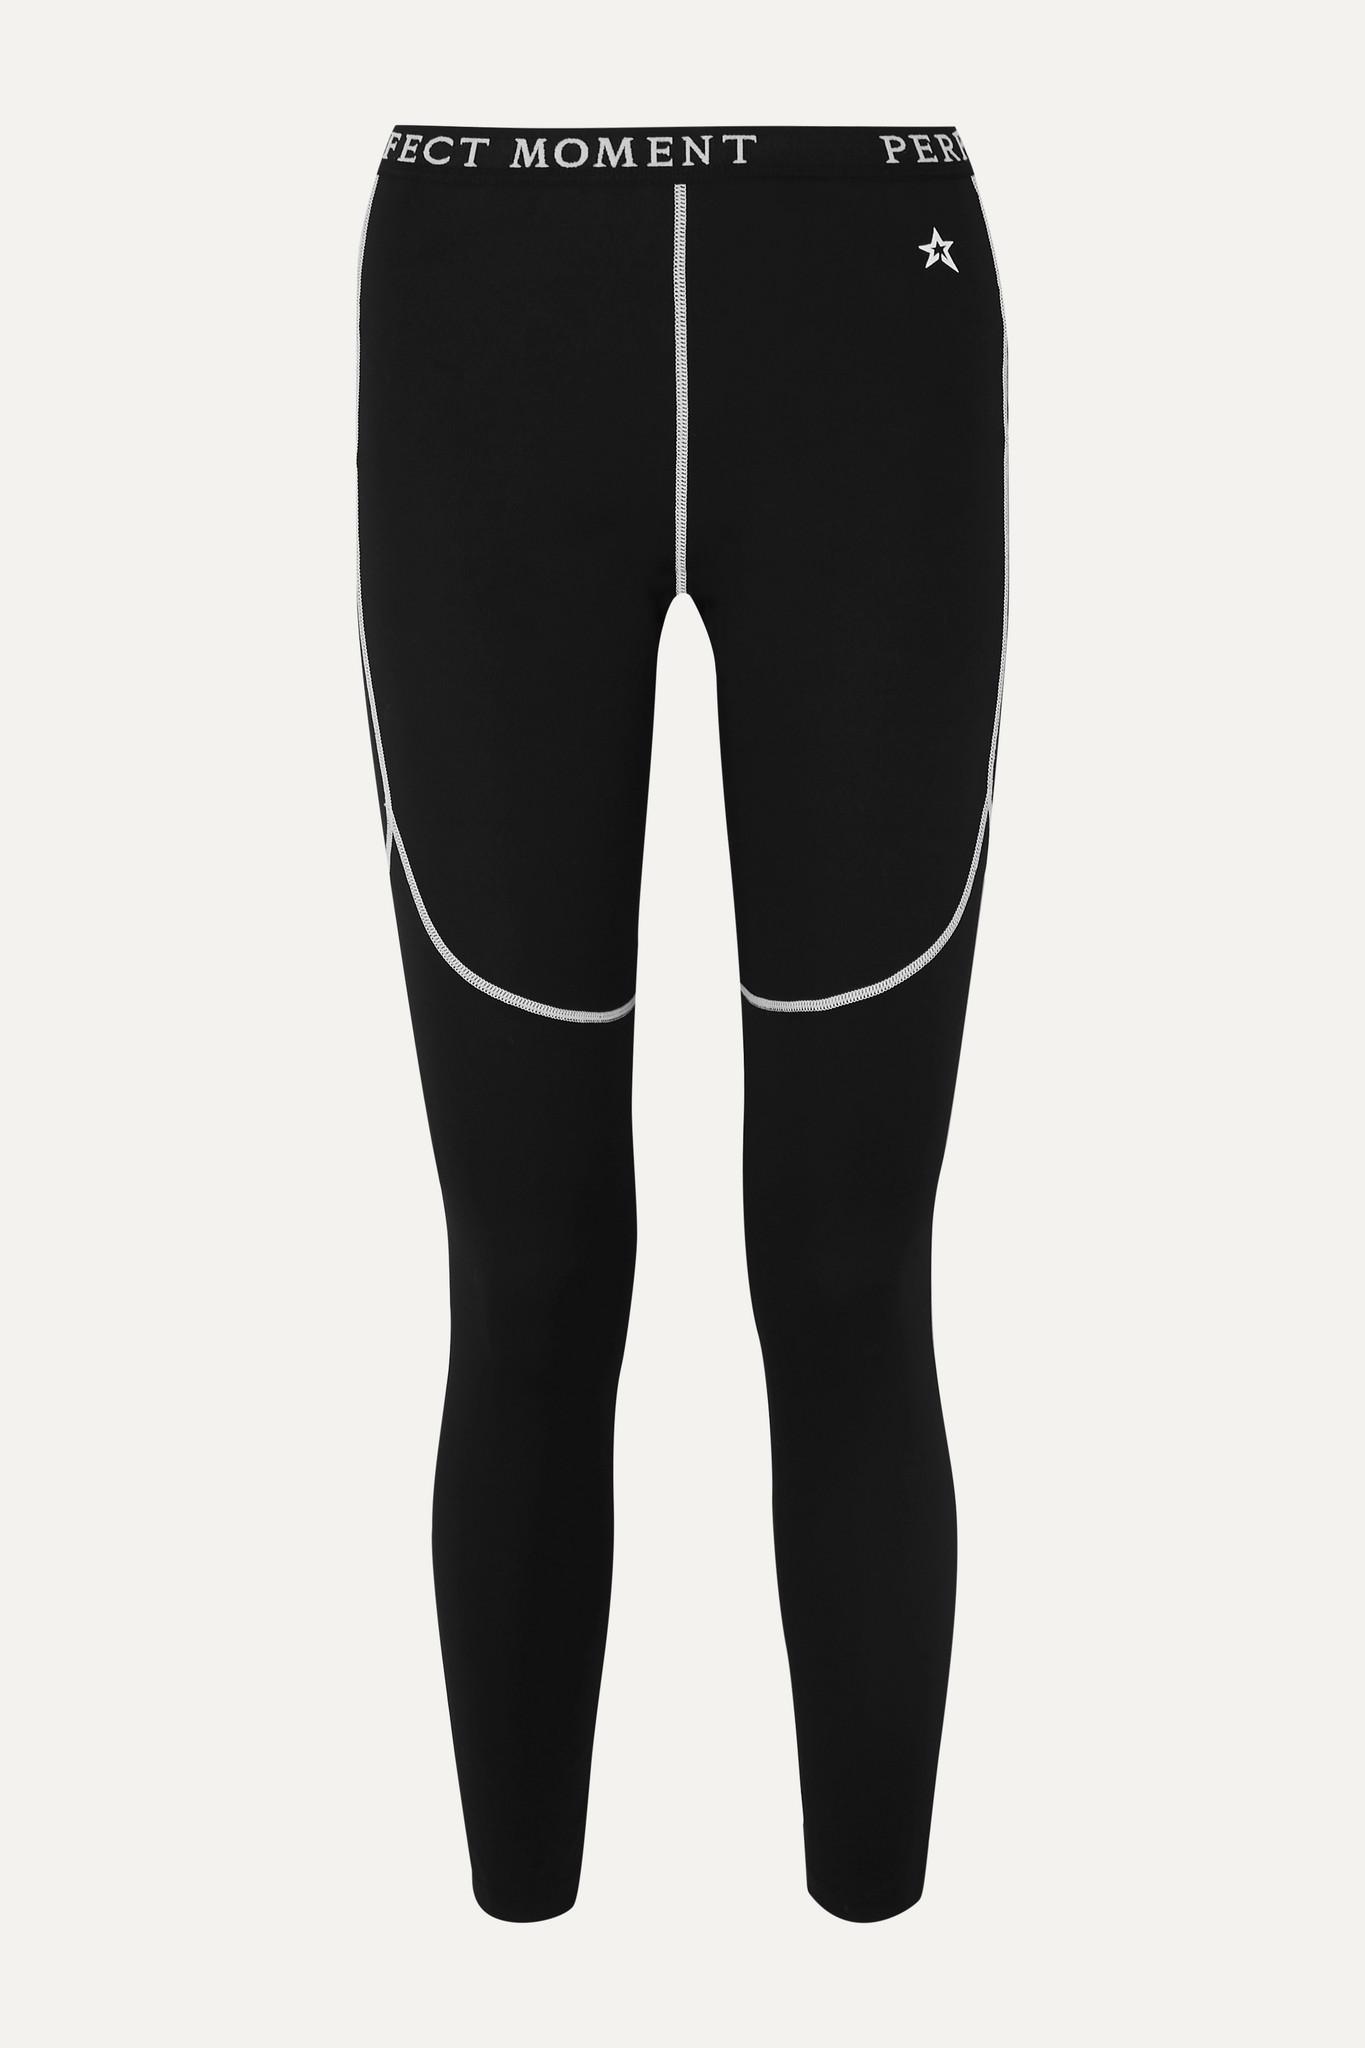 PERFECT MOMENT - Thermal 弹力紧身运动裤 - 黑色 - small